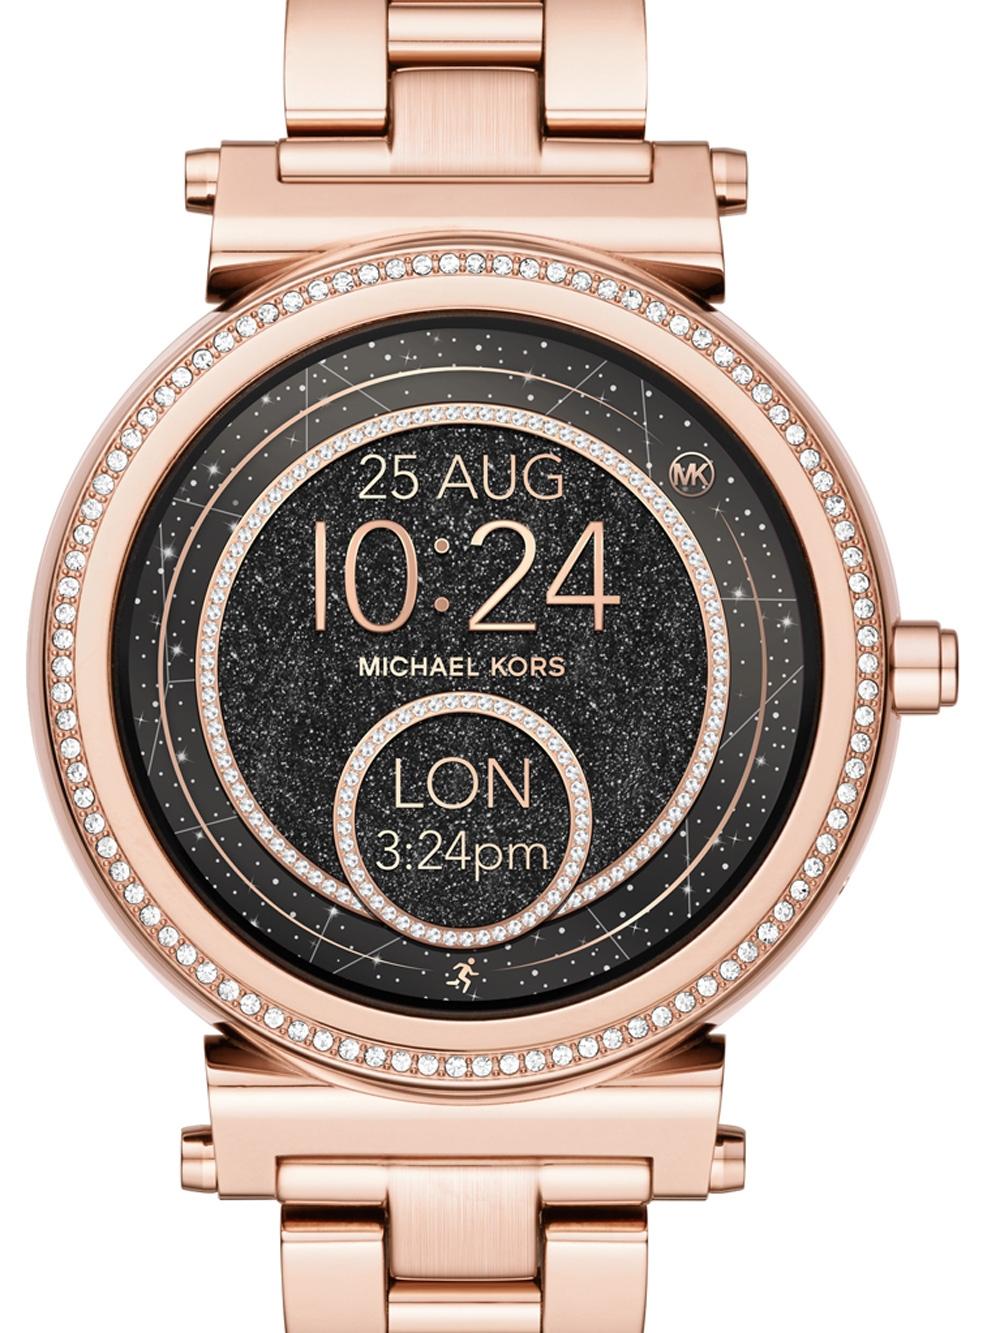 Michael Kors MKT5022 Sofie Access Smartwatch Damen 42mm 5ATM